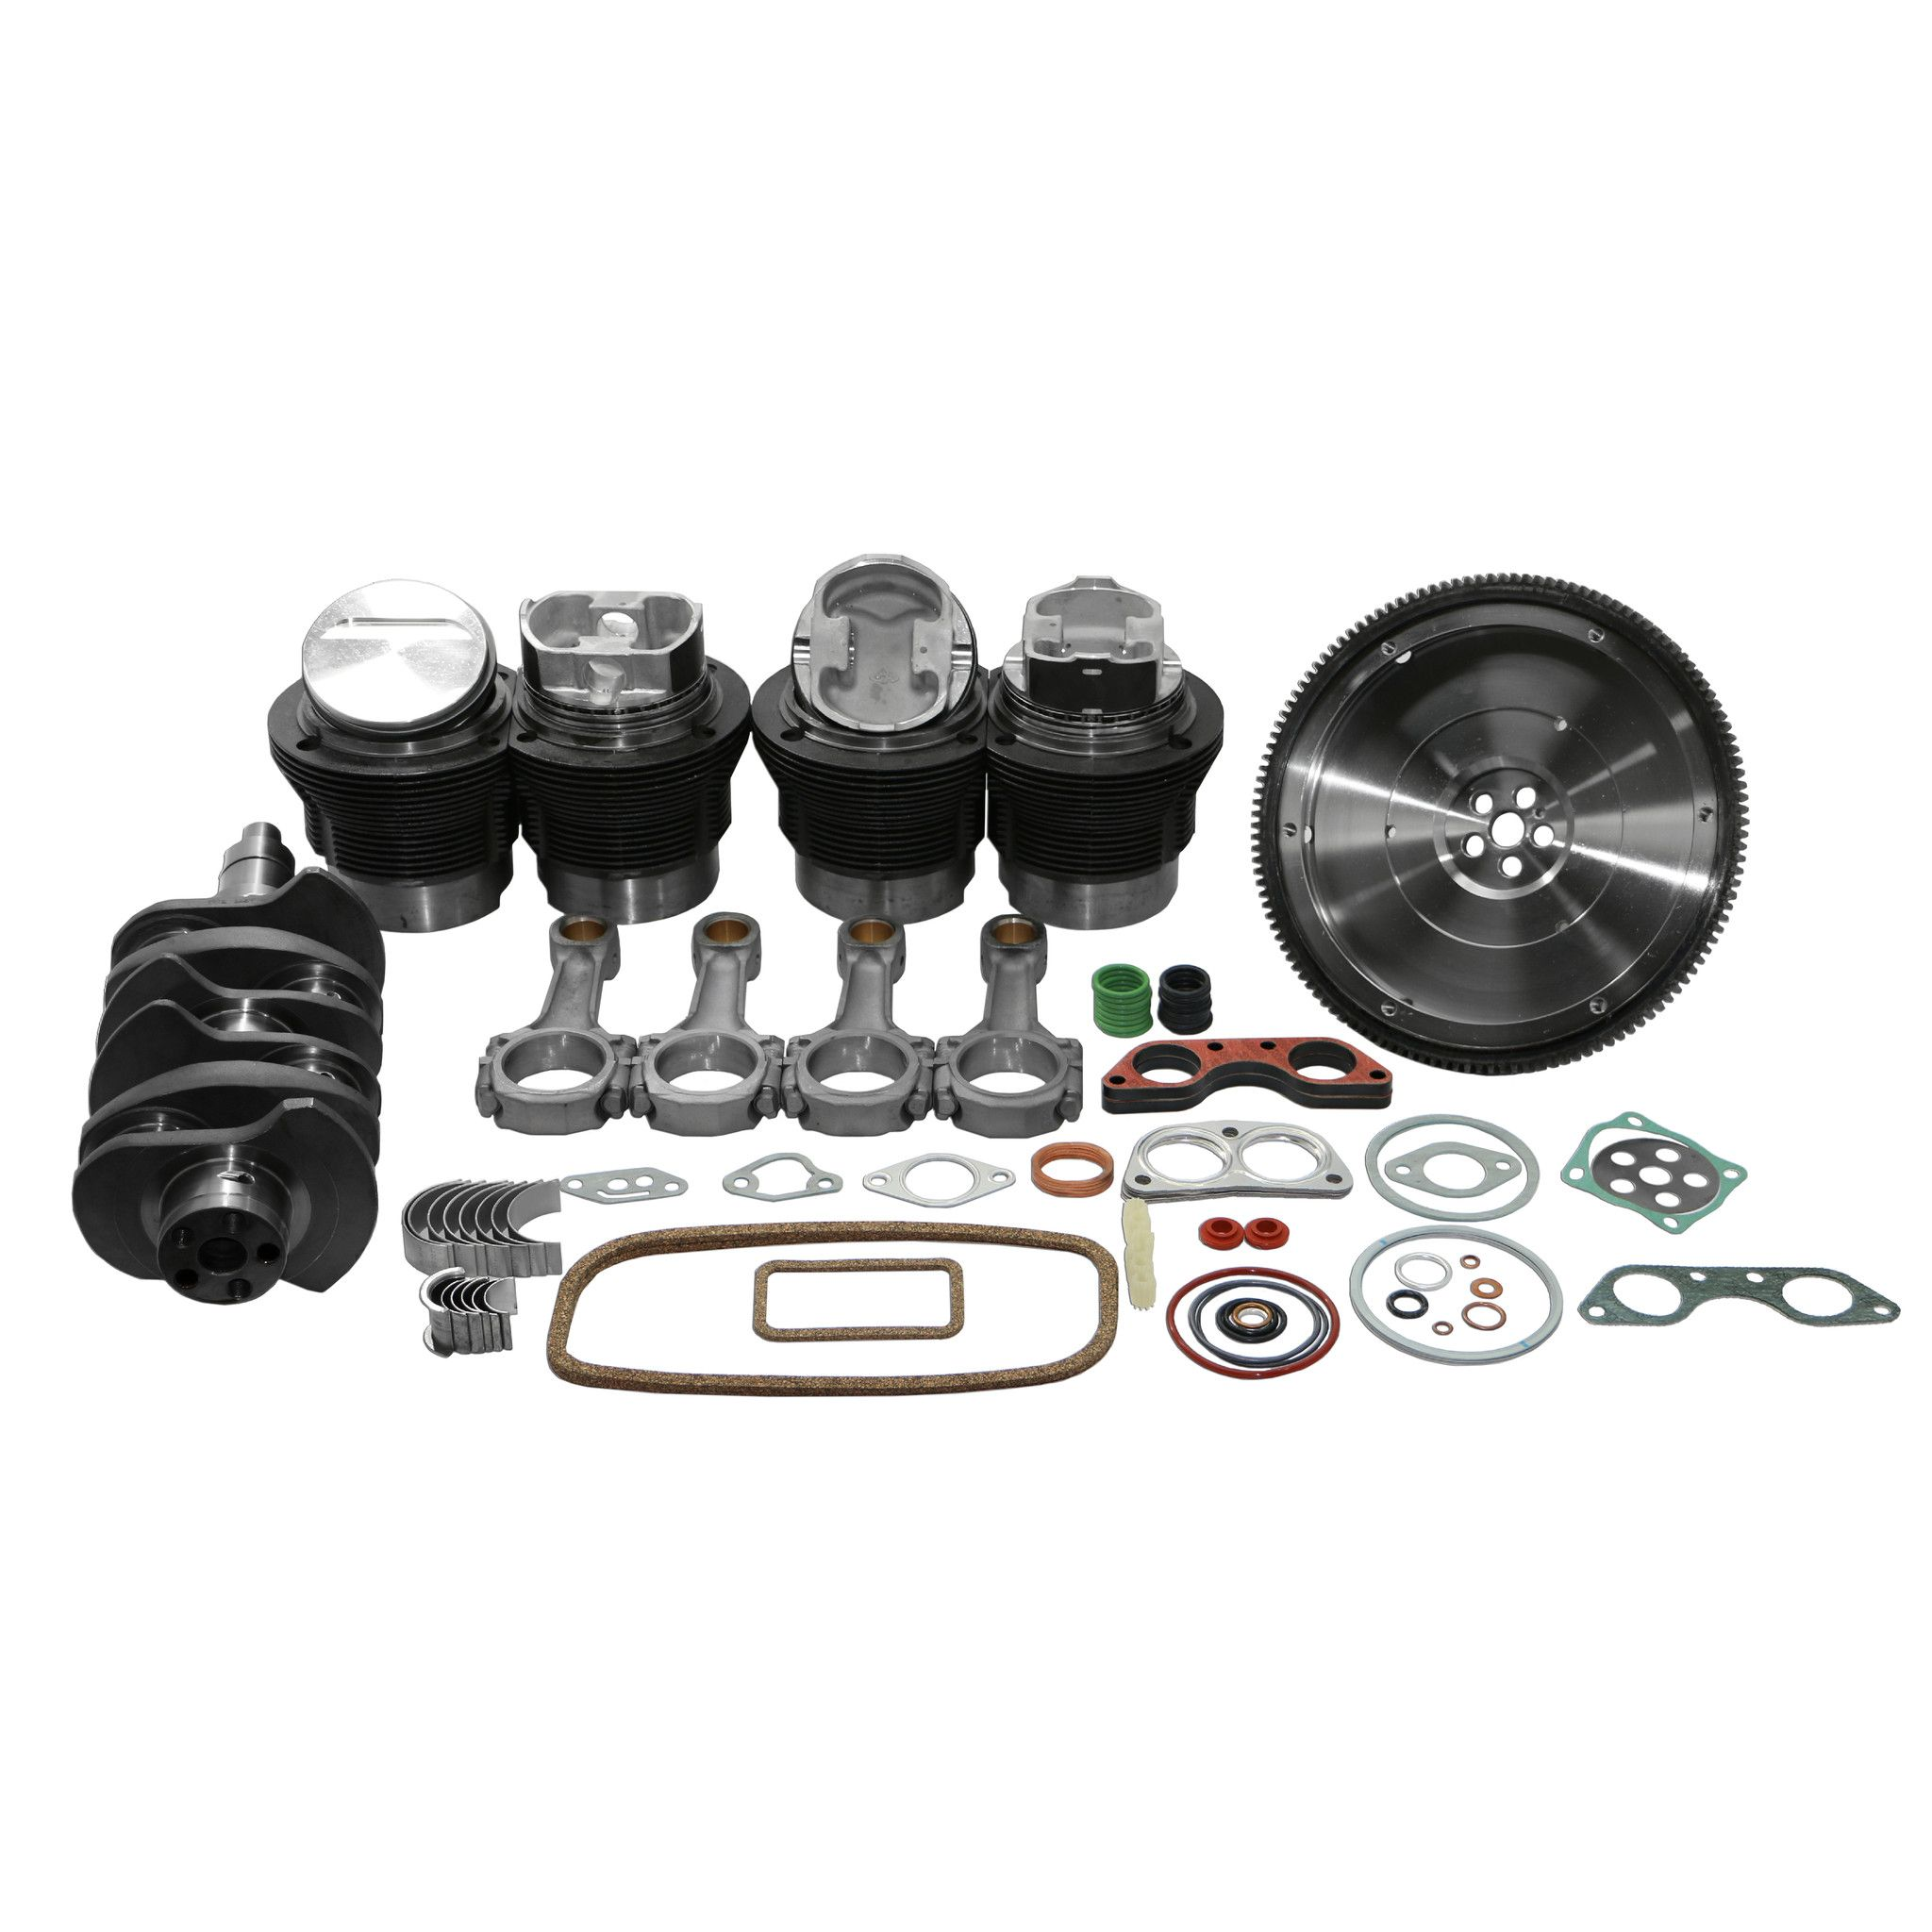 Vw Beetle Engine Builders: VW Type 4 Budget Engine Rebuild Kit